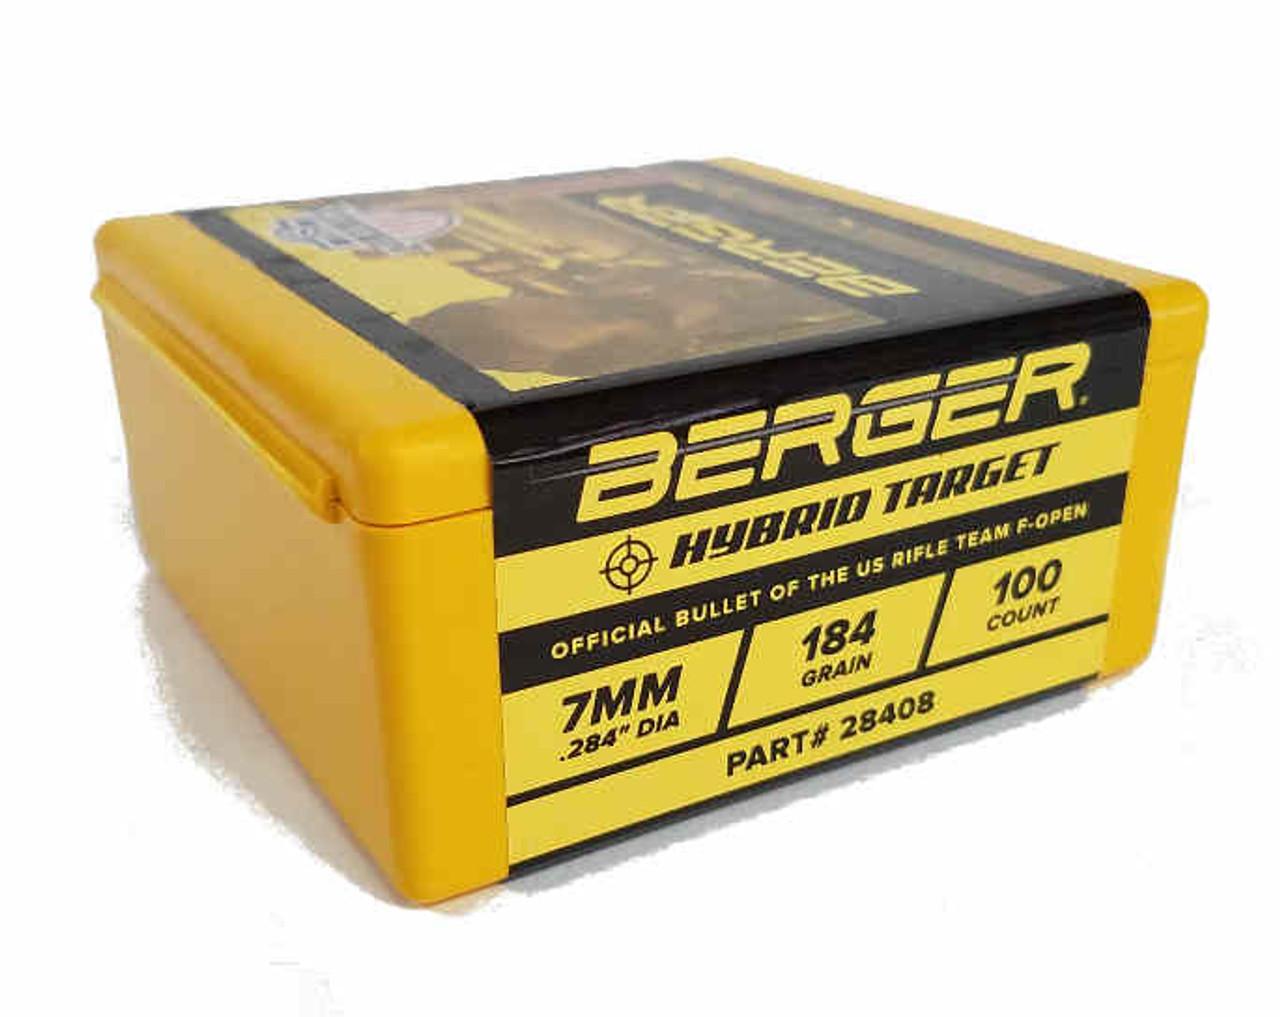 Berger F-Open Hybrid Target Bullets 7mm Caliber  284 Diameter 184 Grain,  Spitzer, 12 pack